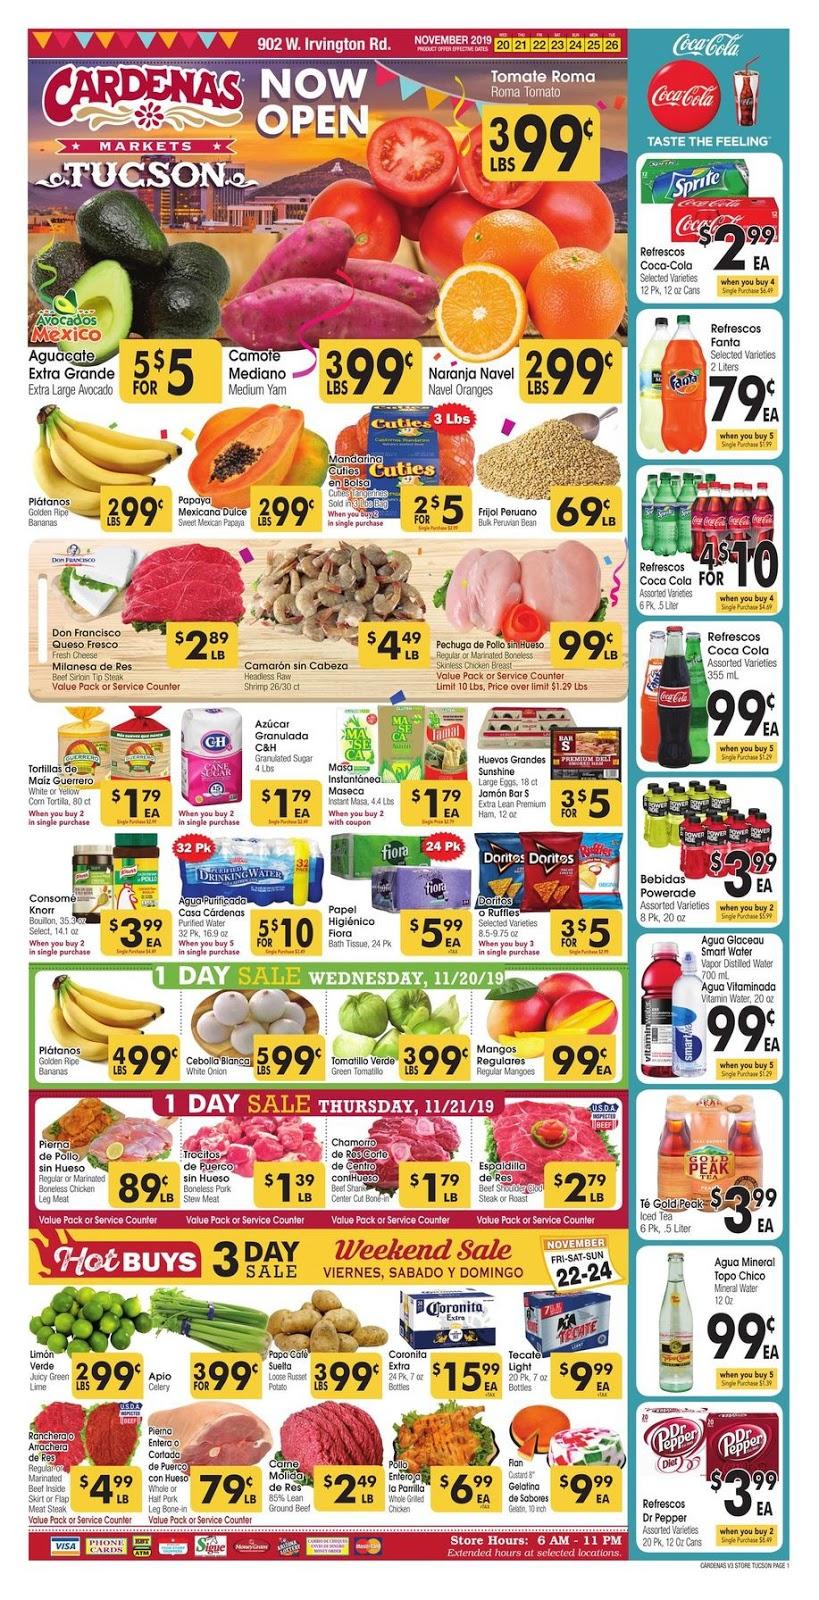 Cardenas Weekly Ad